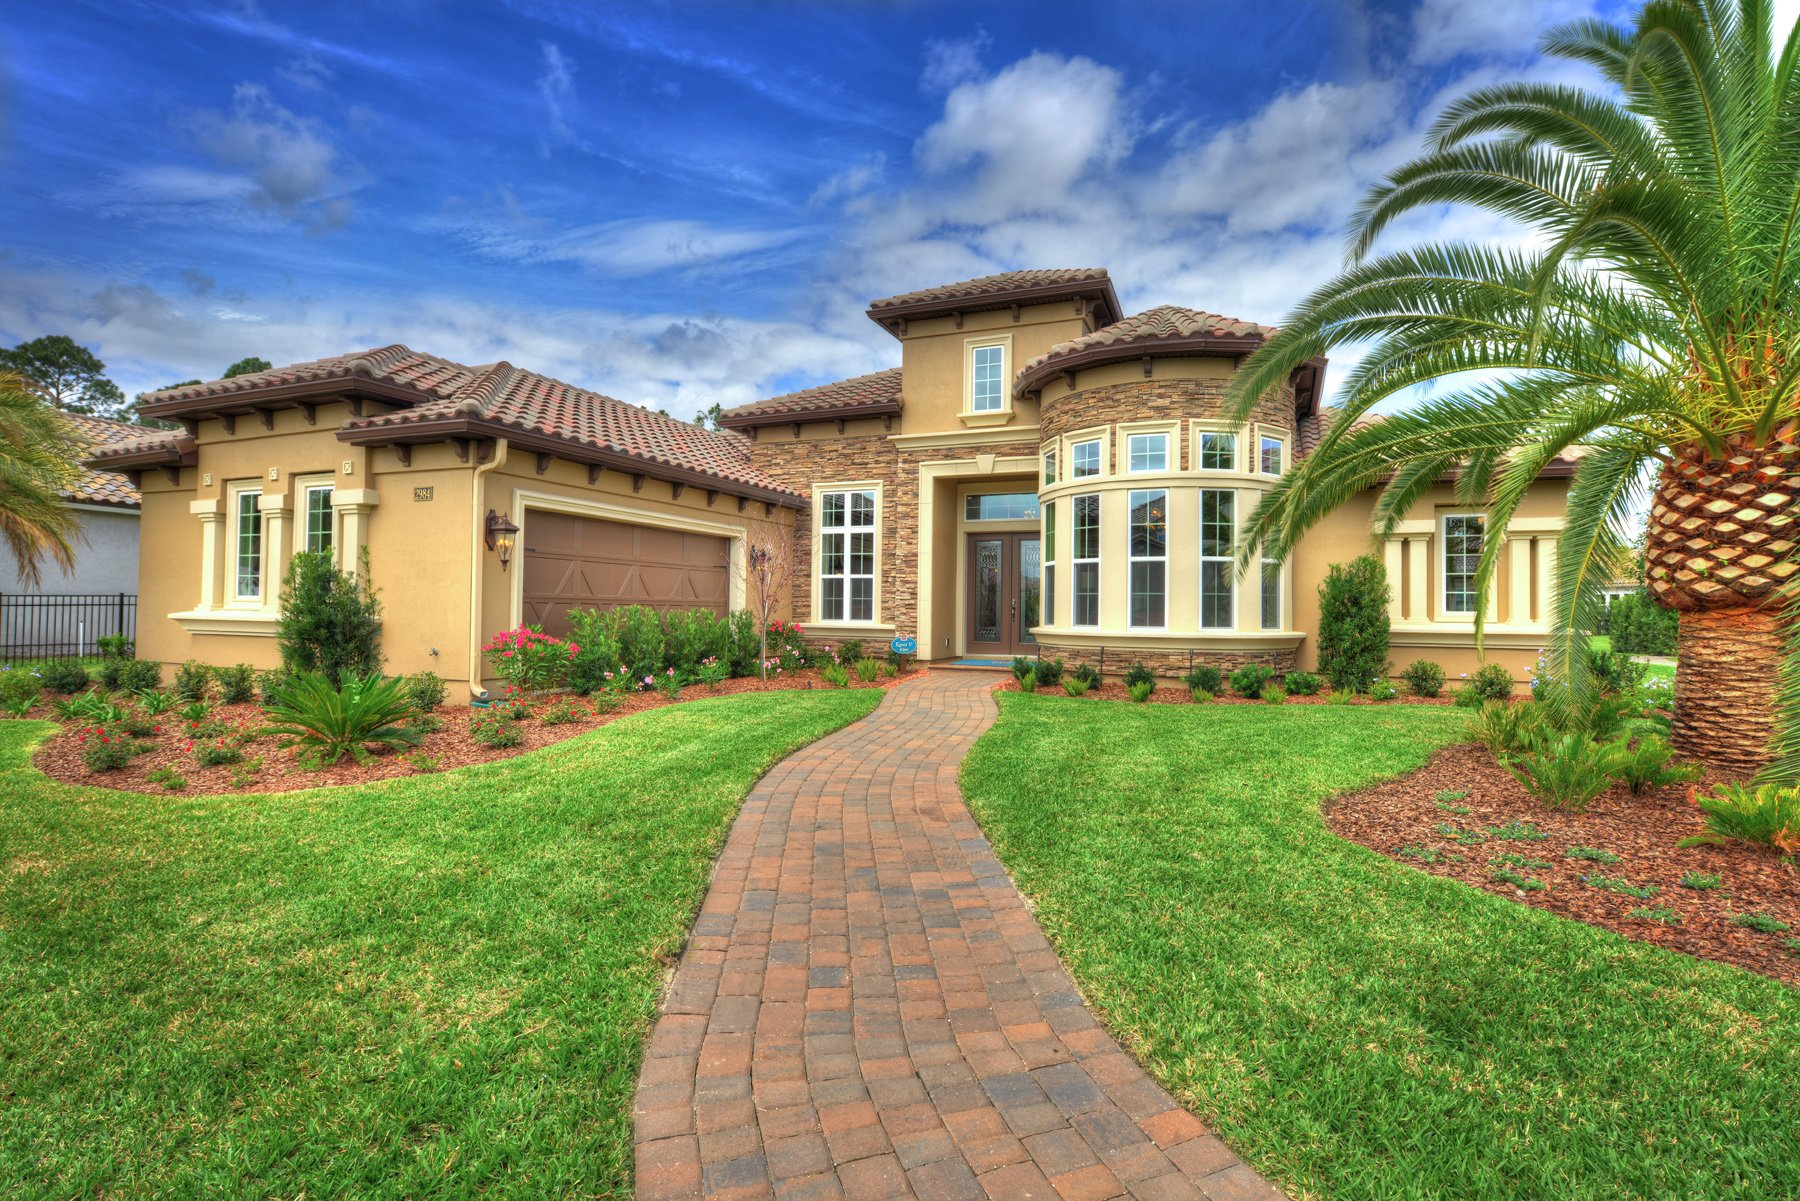 Jacksonville Area Real Estate to Remain Strong - ICI Egret V 42 3 4 5 6 7 8 tonemapped